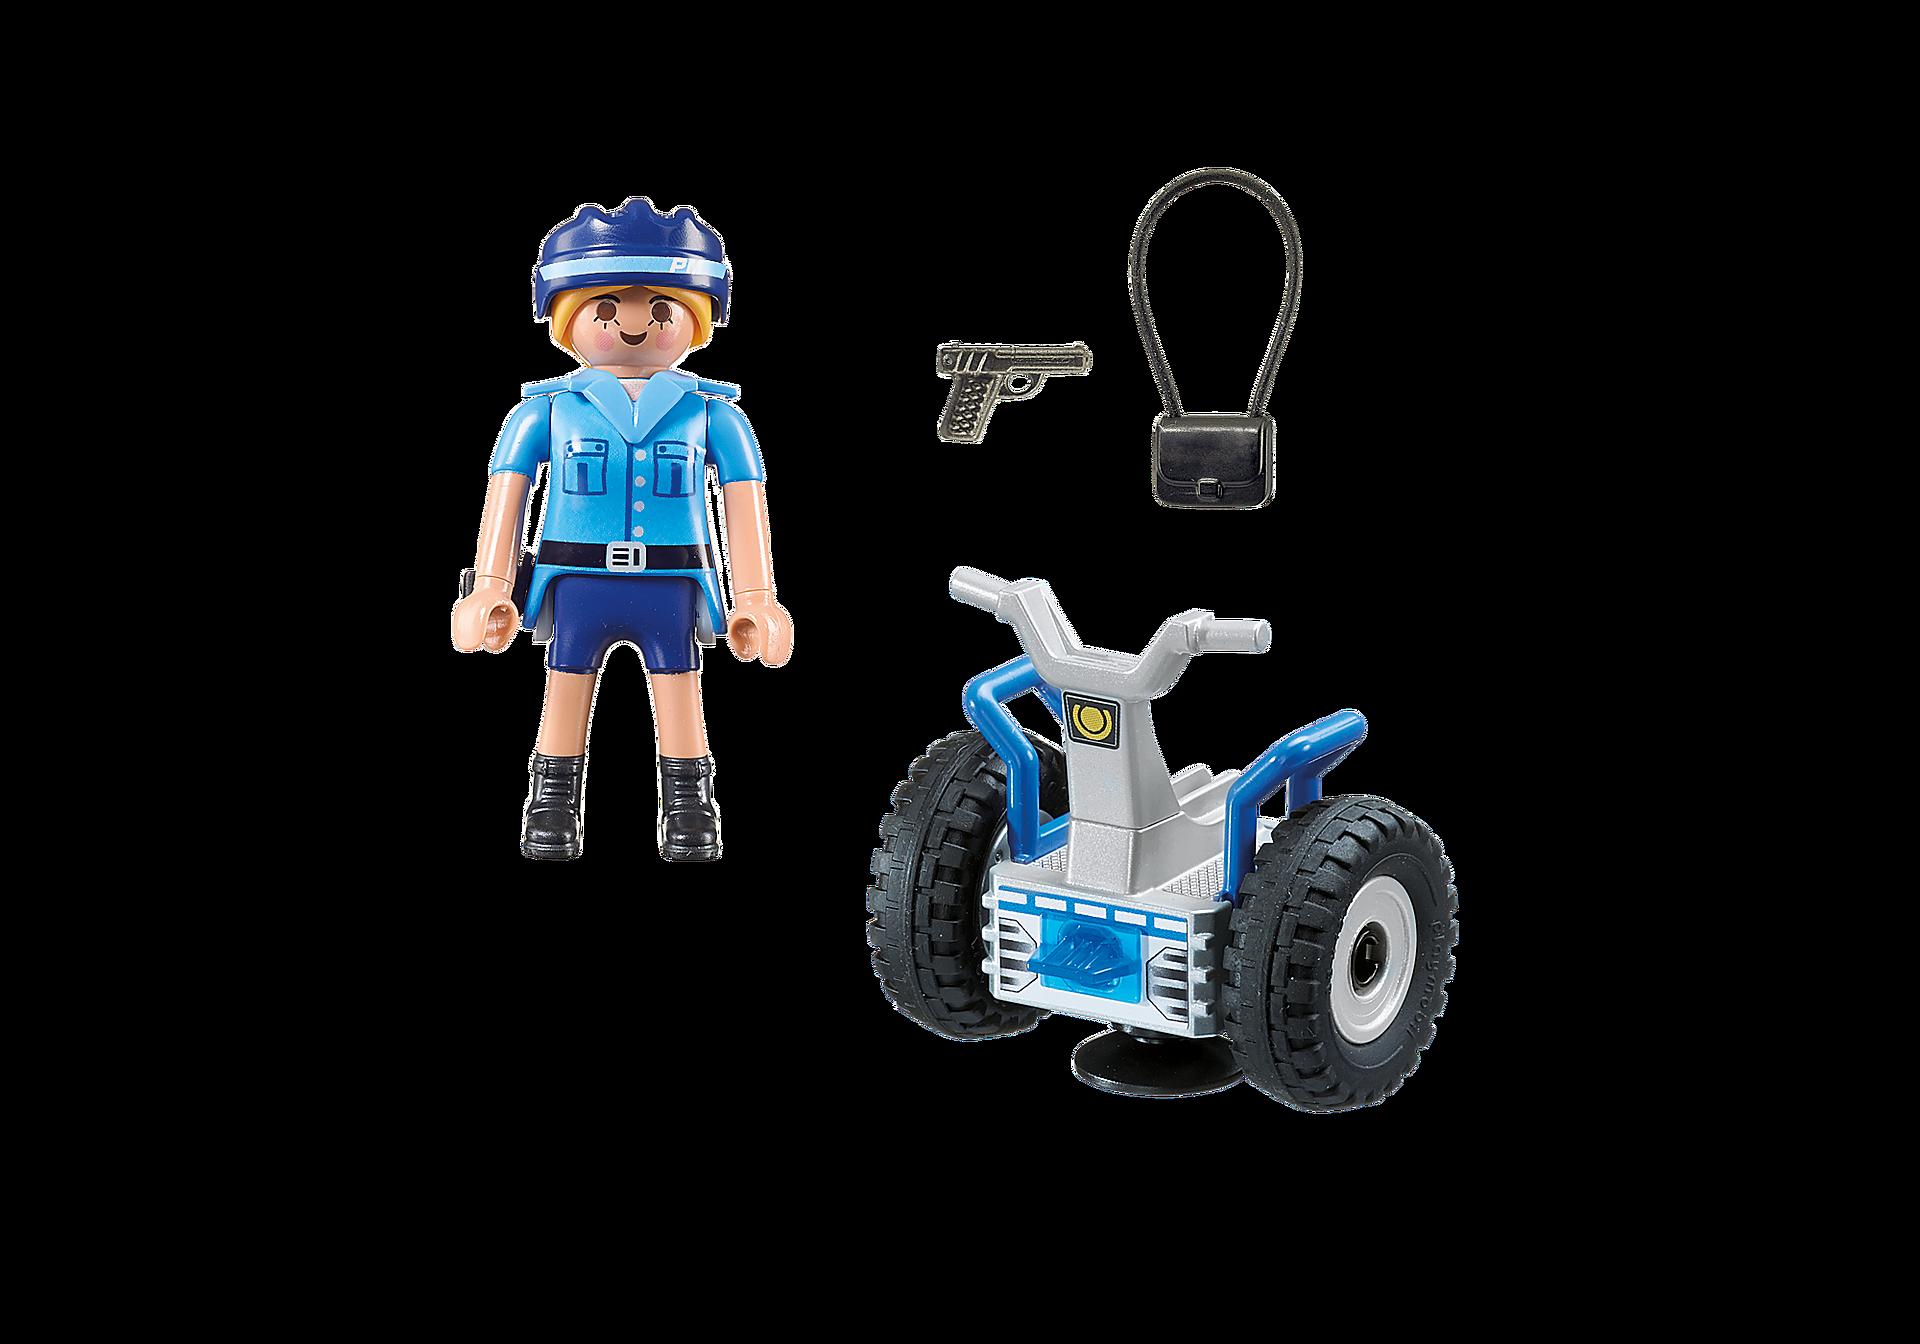 6877 Polizistin mit Balance-Racer zoom image4